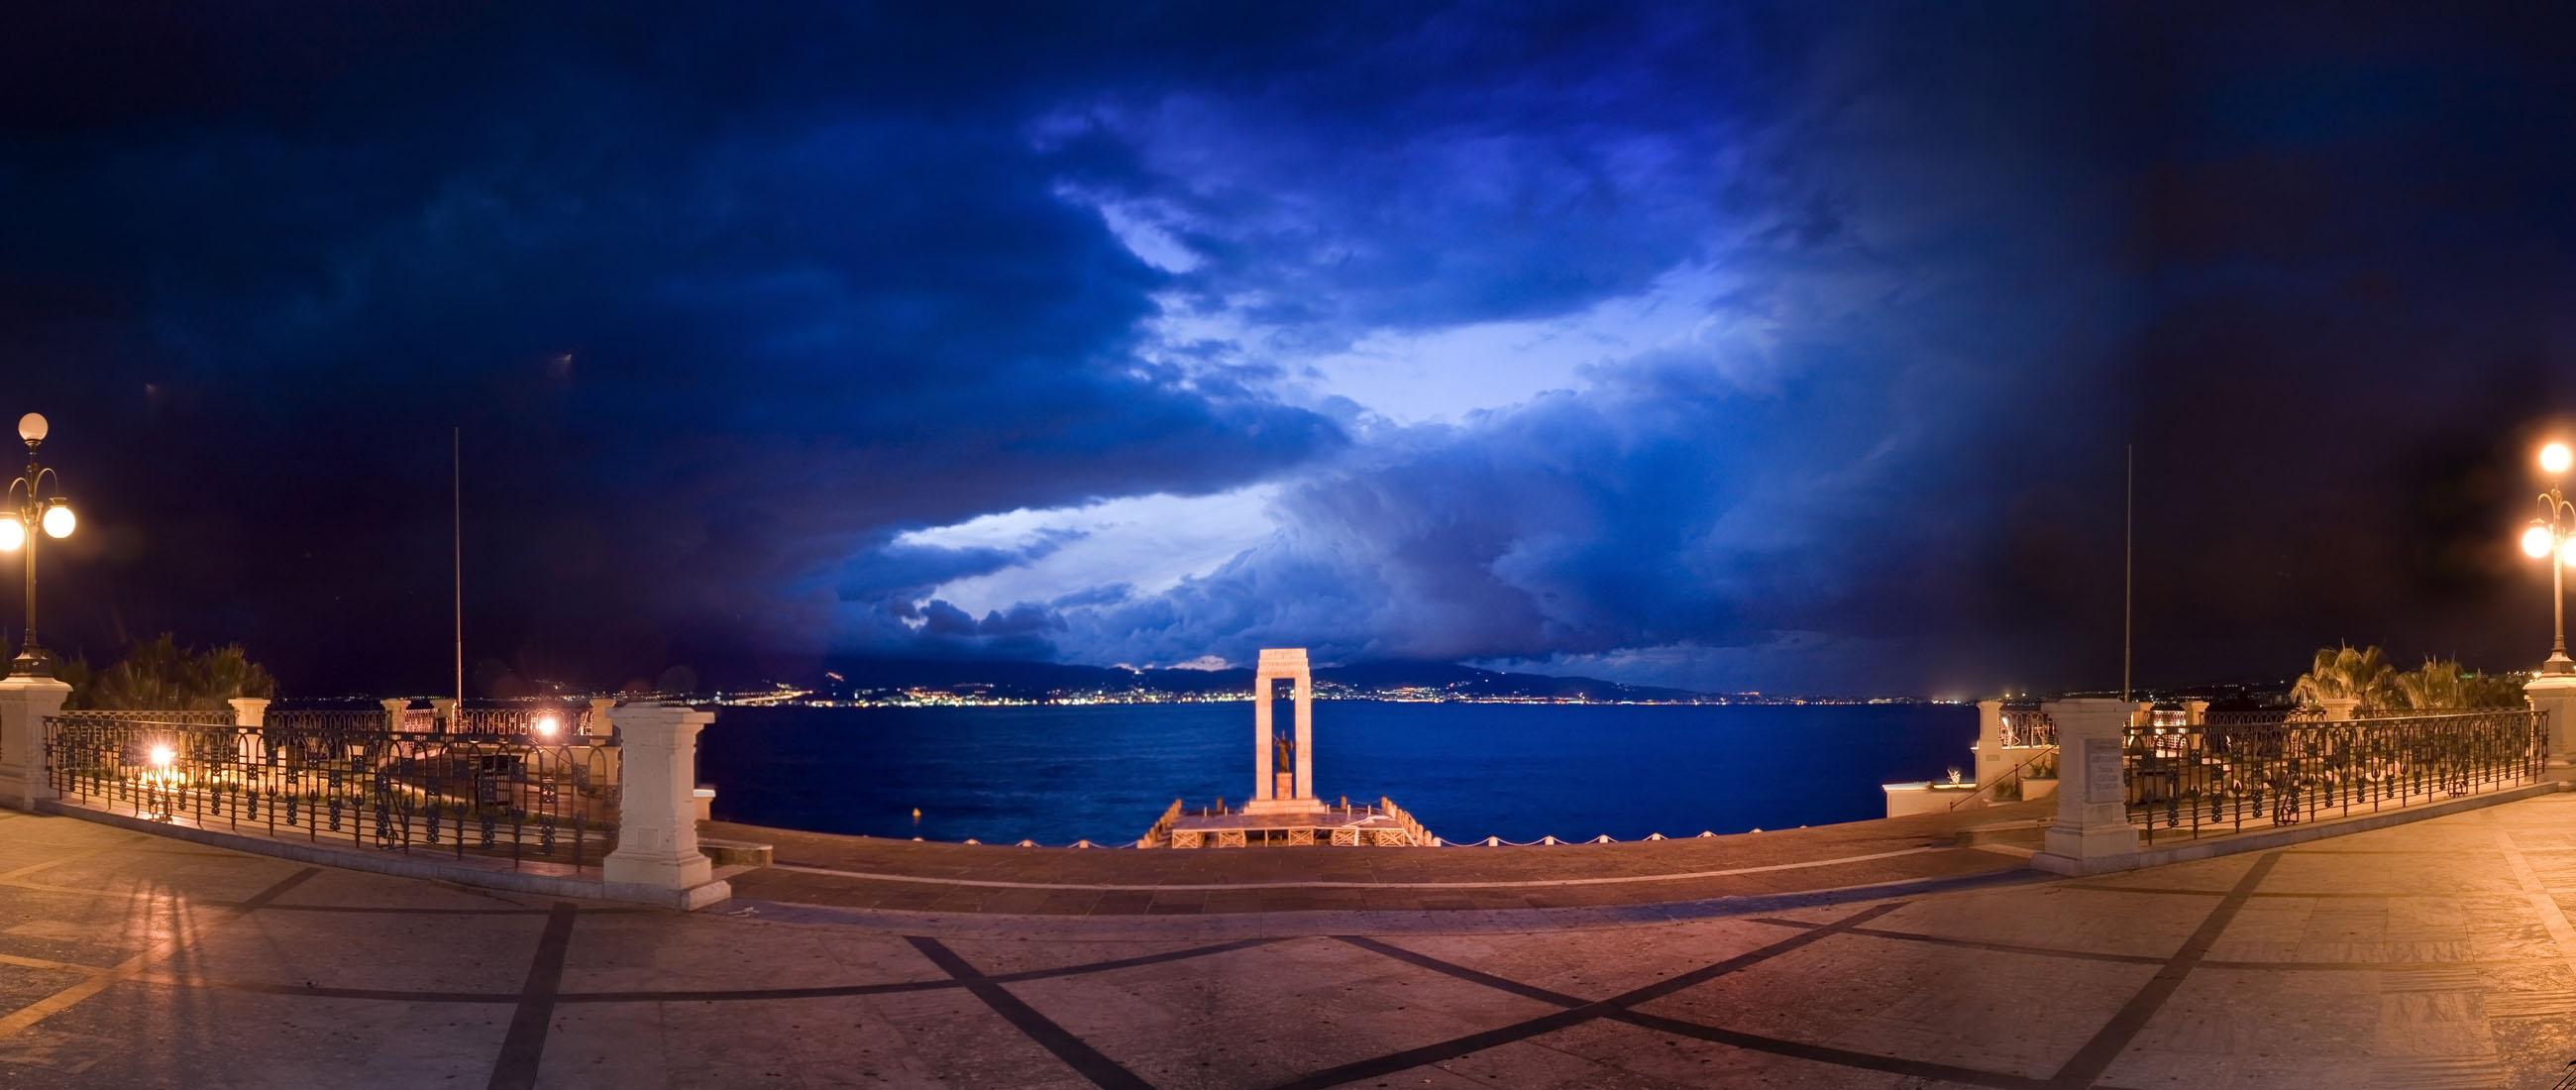 Reggio Calabria lungomare Panorama